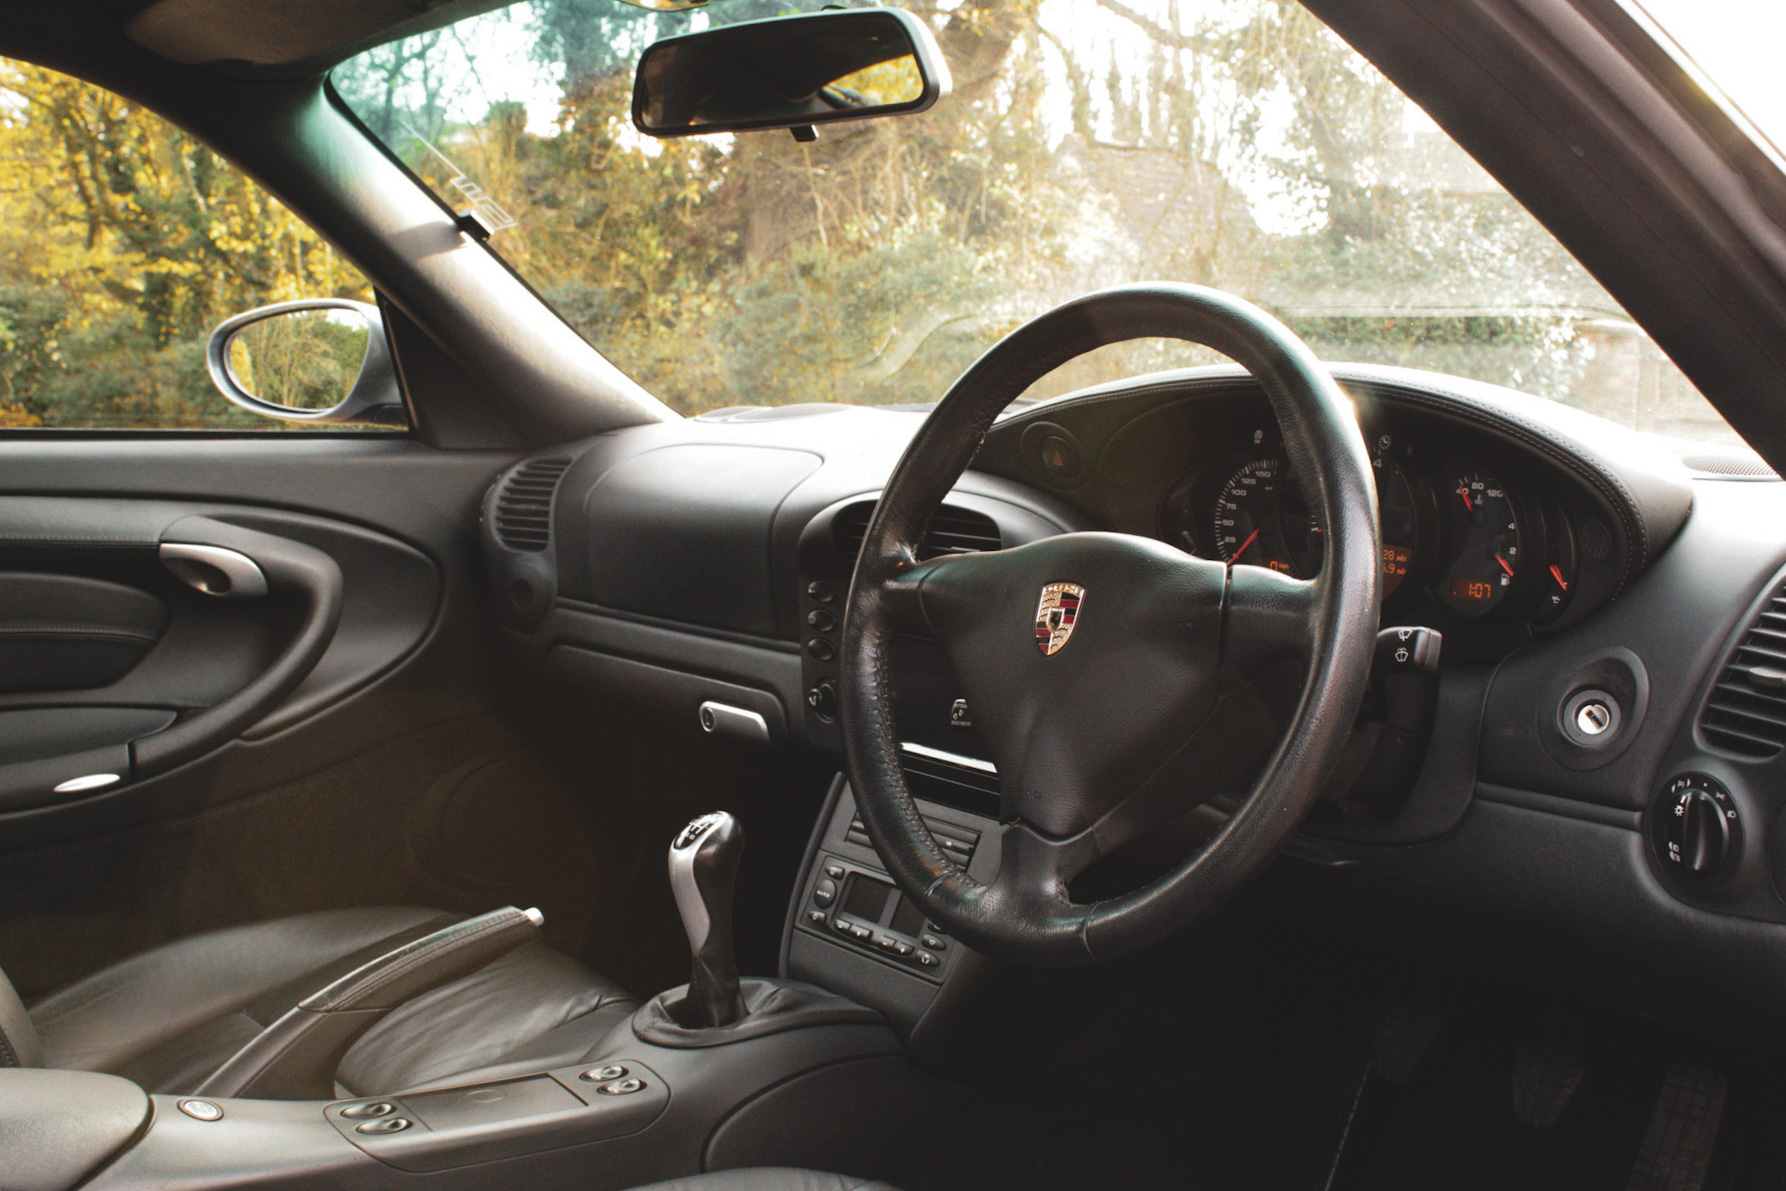 2003 Porsche 911 3.6 996 Carrera 2 – NOW SOLD full